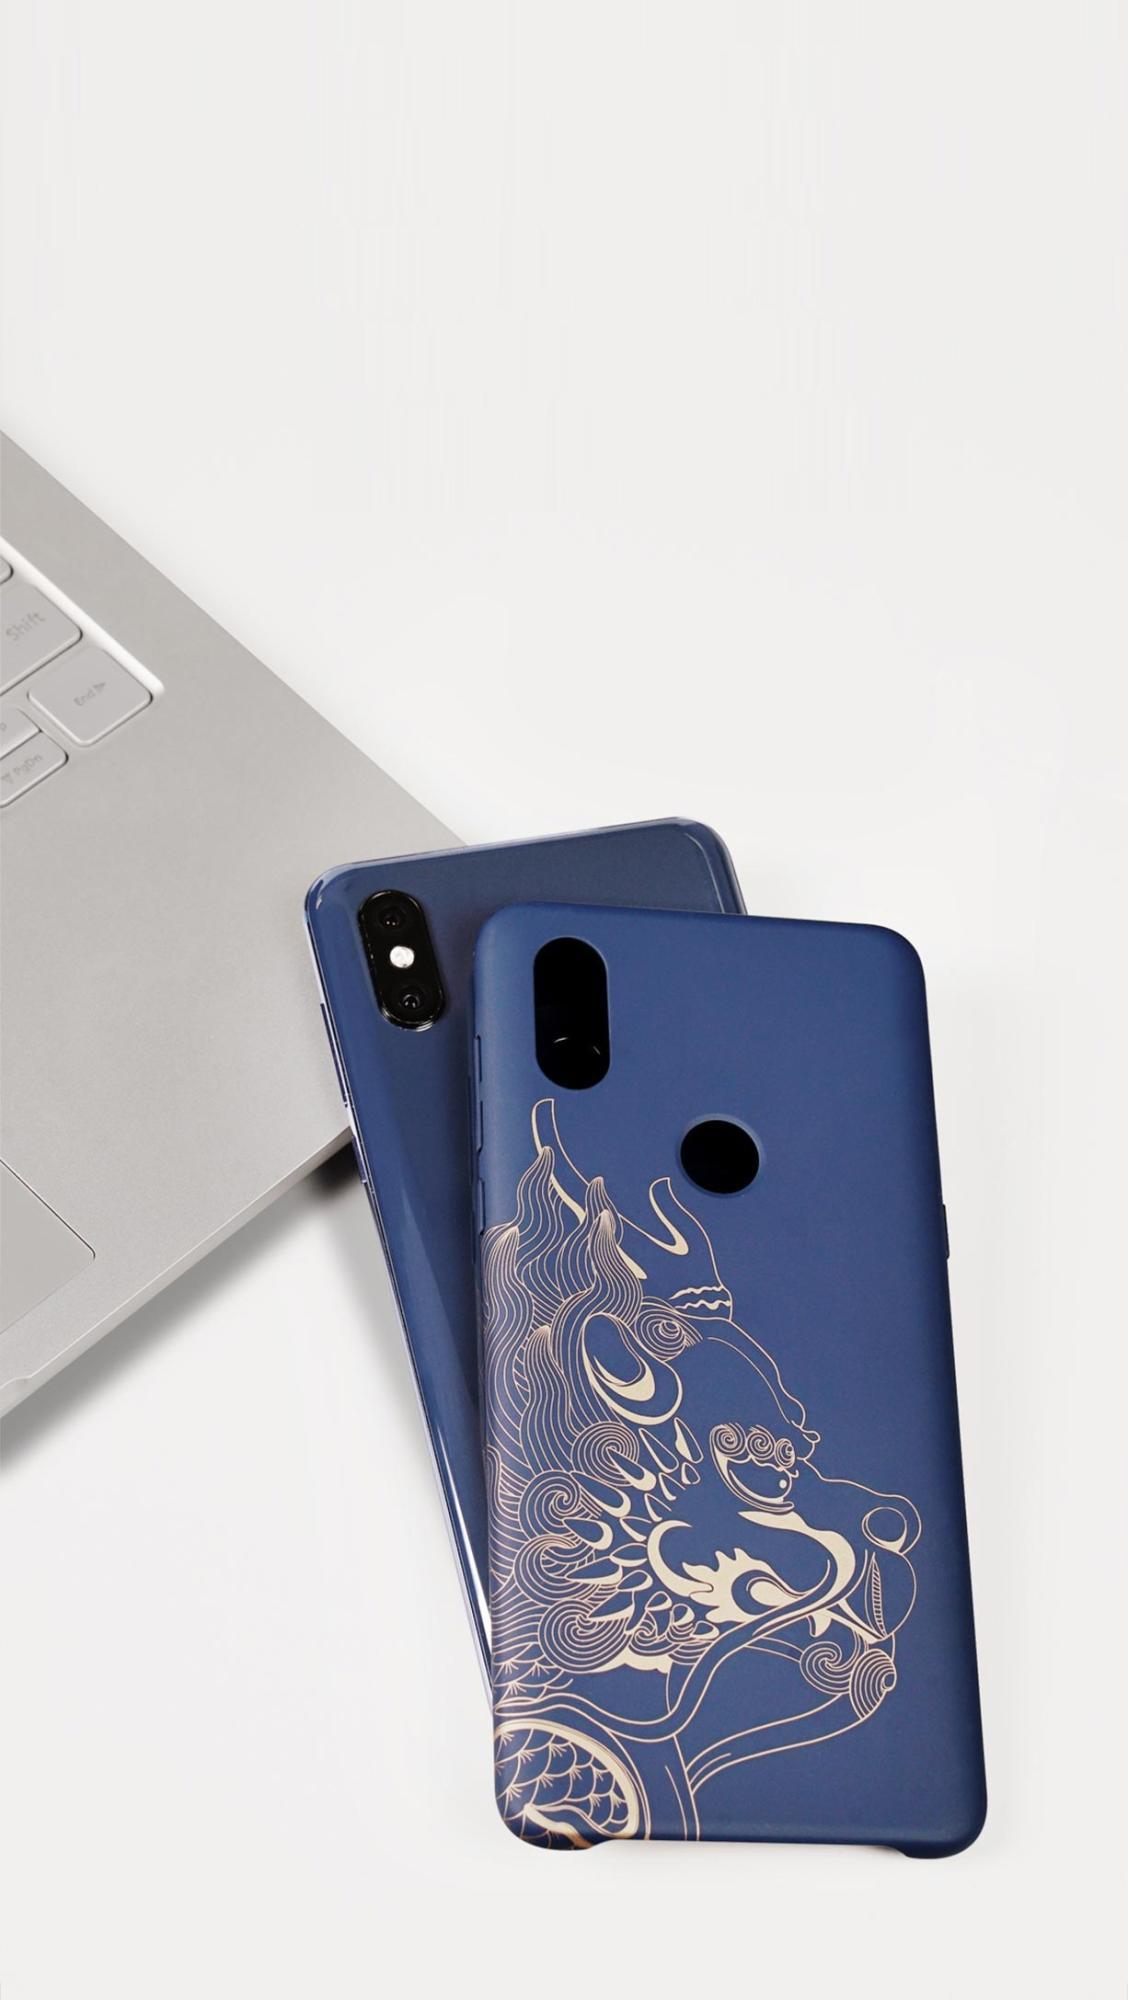 Xiaomi Mi Mix 3 Forbidden City Hard Case